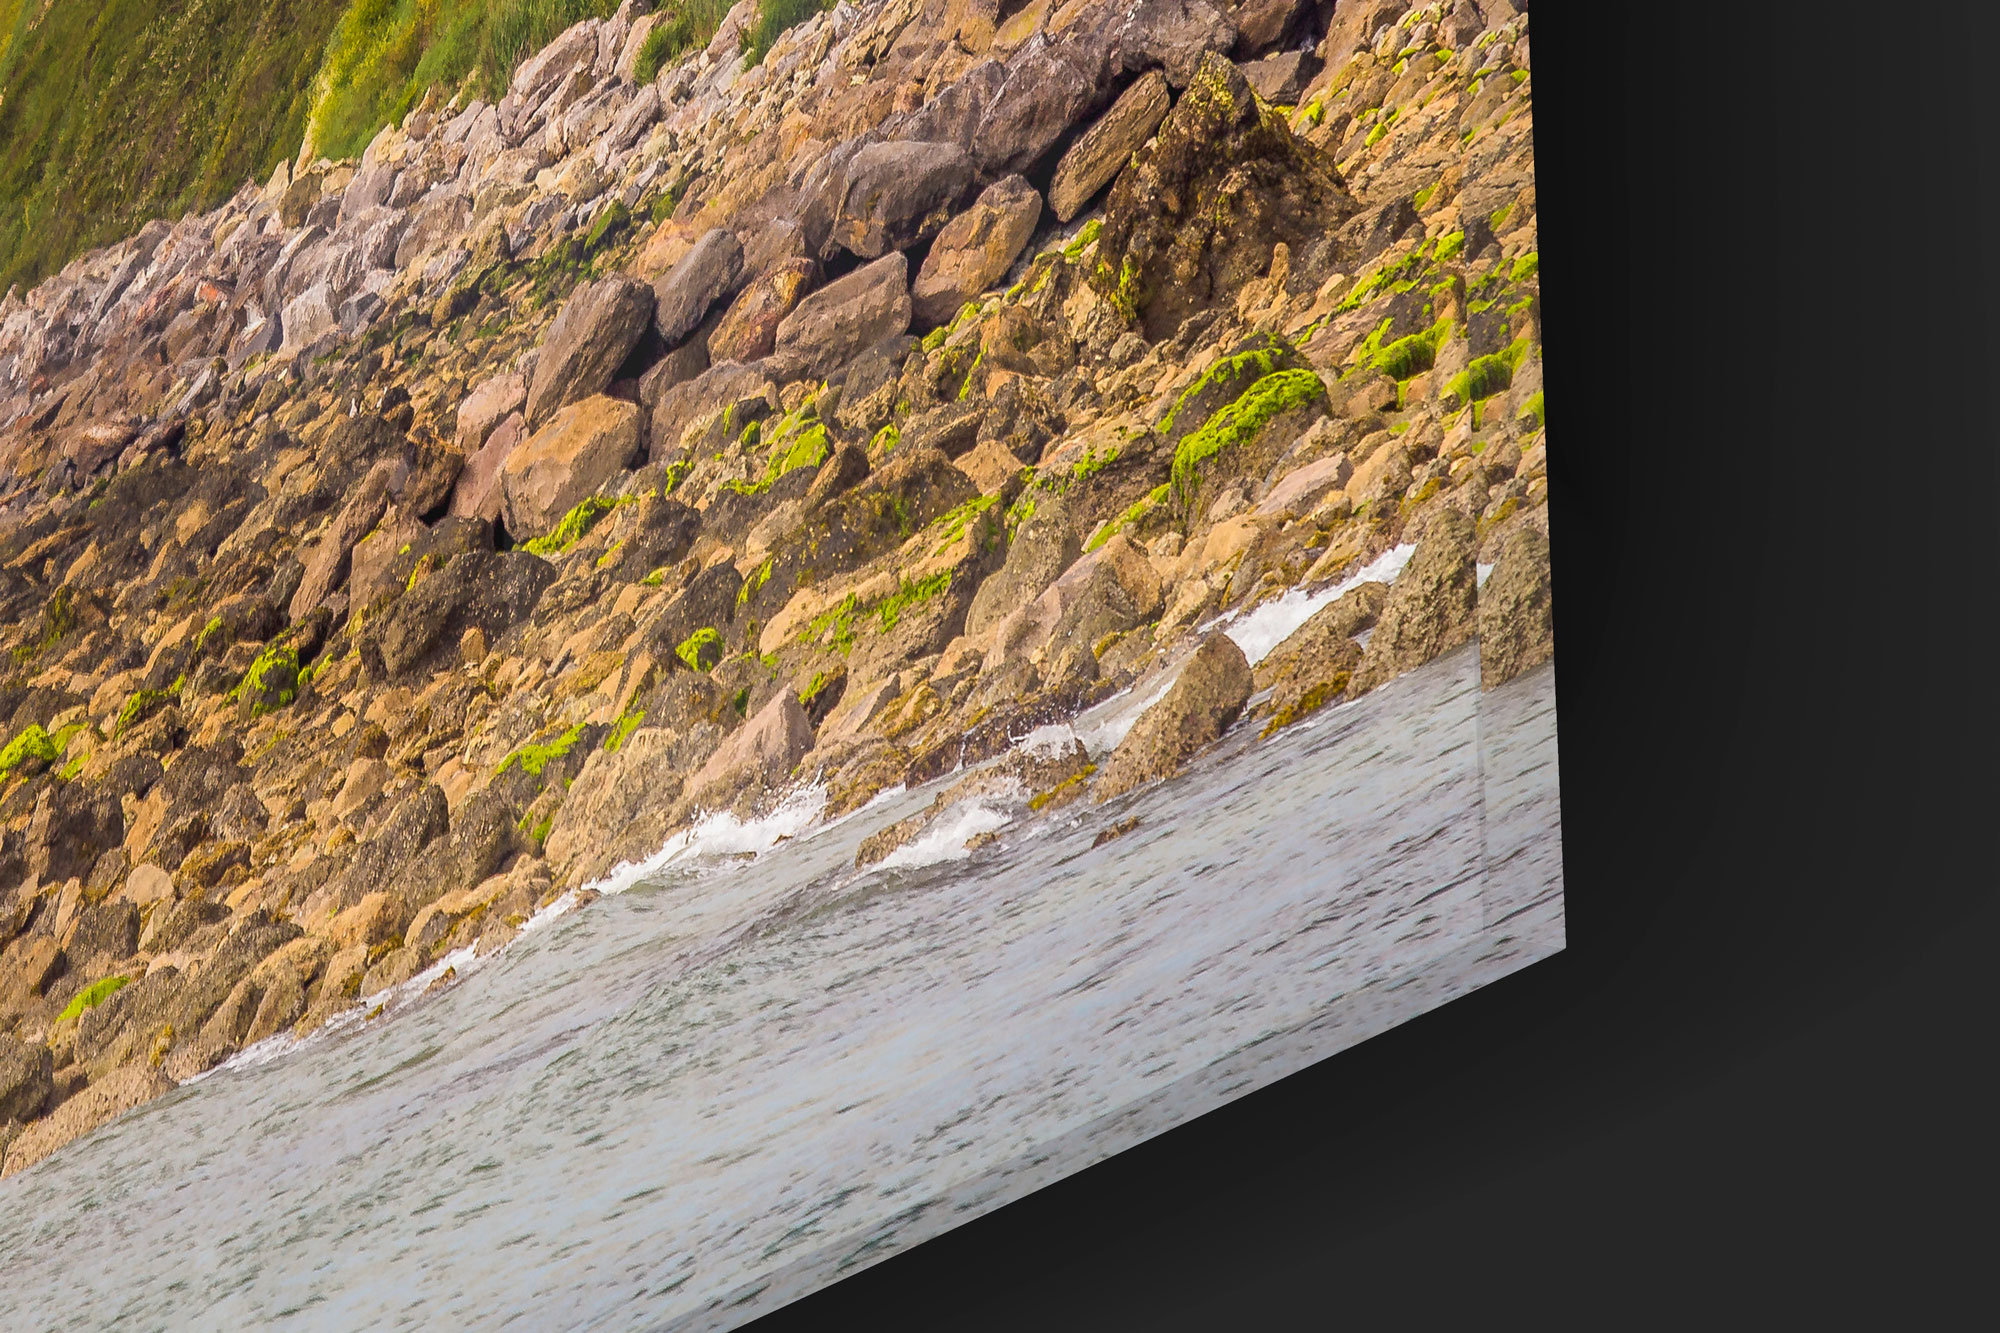 Steephill-Cove--RTIR-Coastline-Right-.jpg